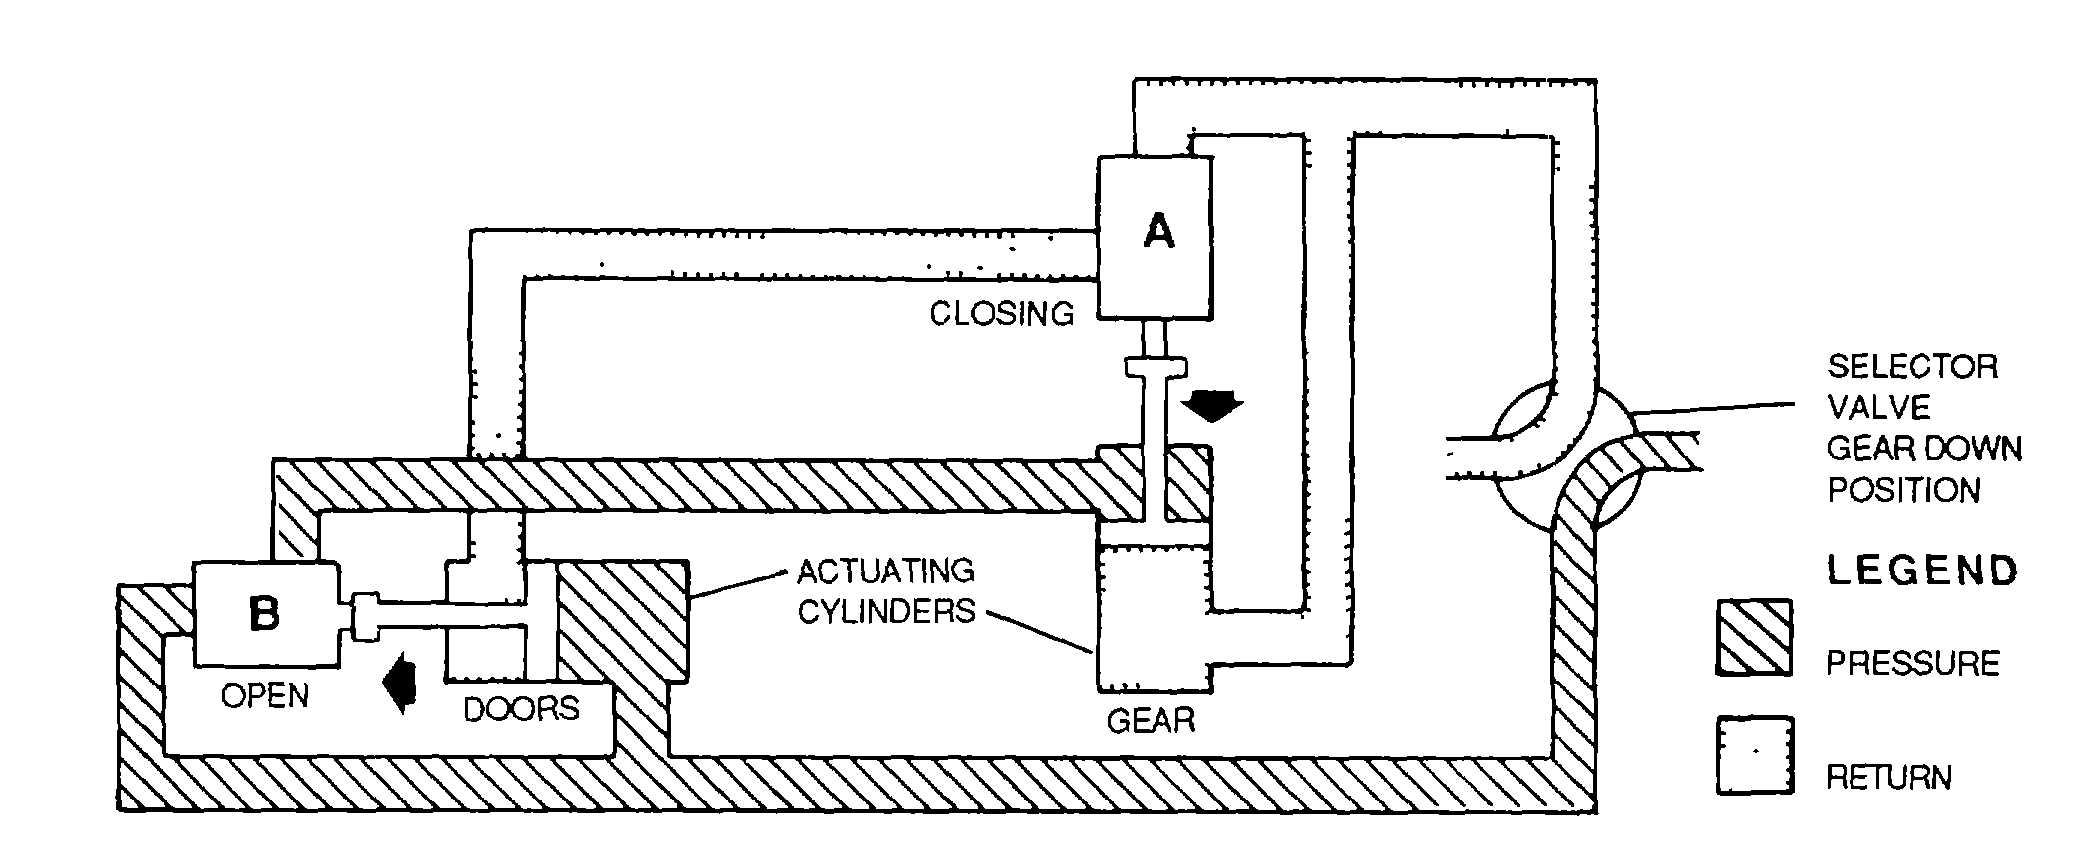 Figure 4 129 Landing Gear System Using Mechanically